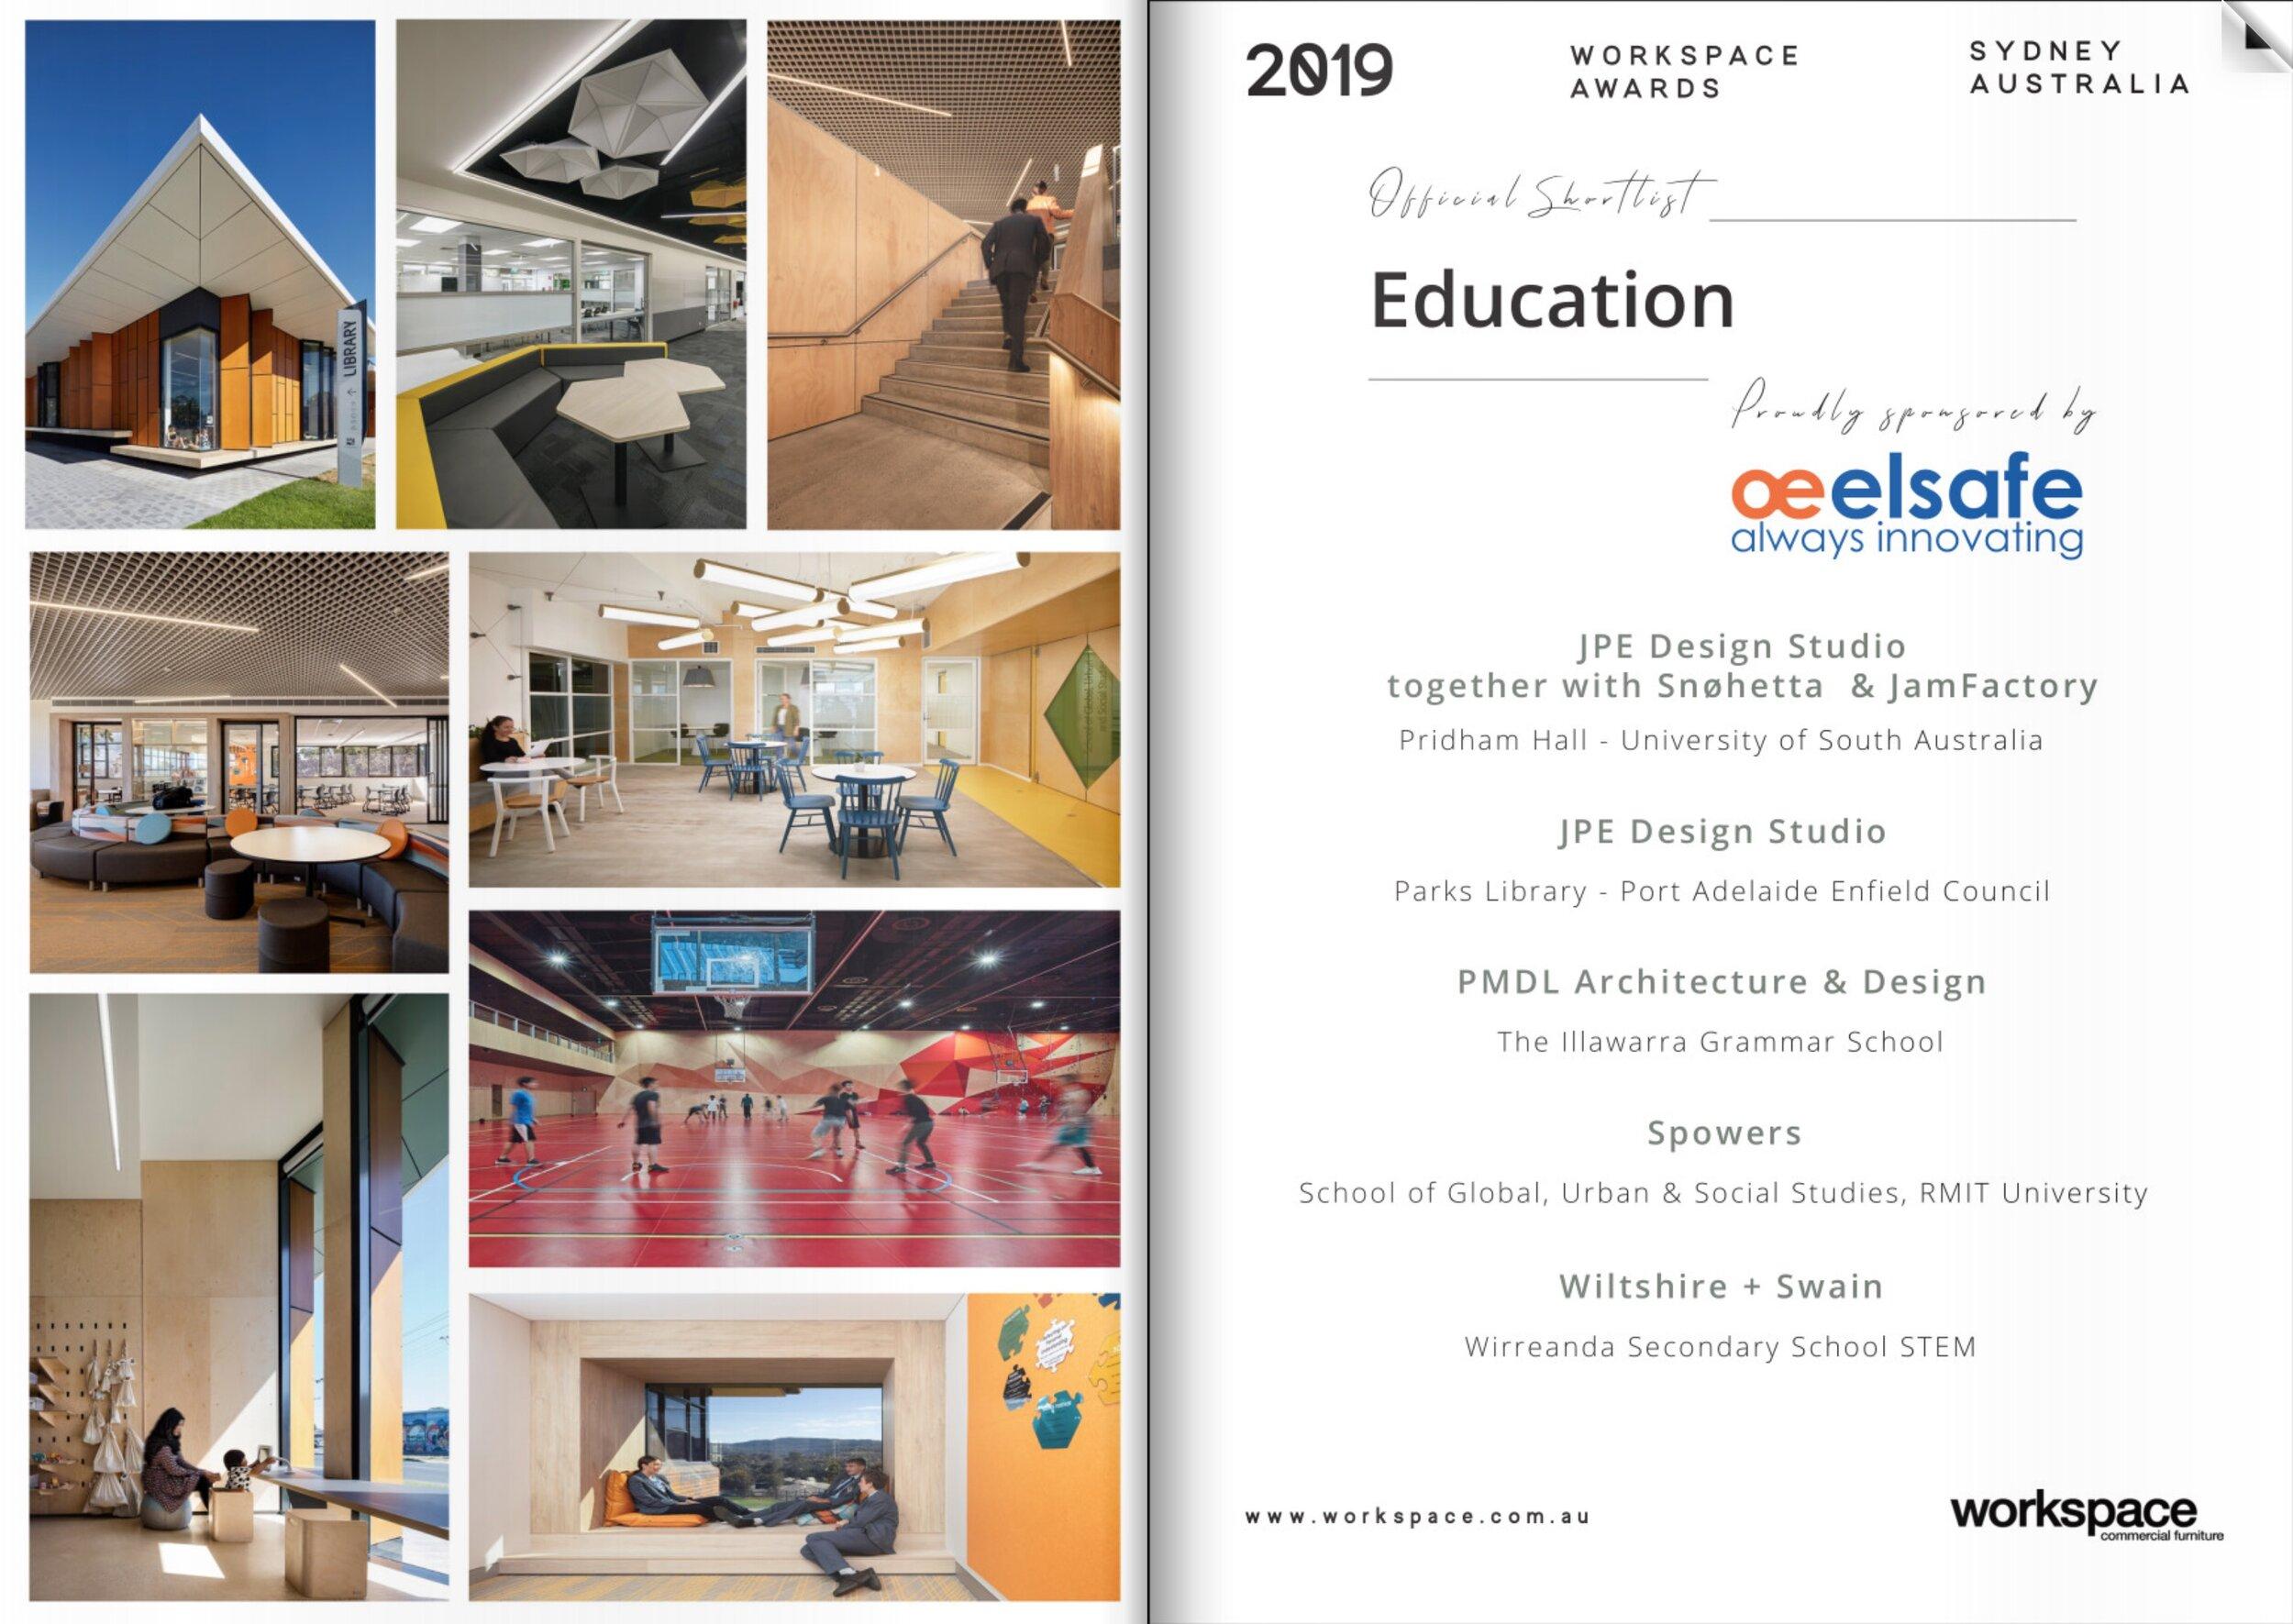 Workspace Awards 2019 Education Shortlist.jpg